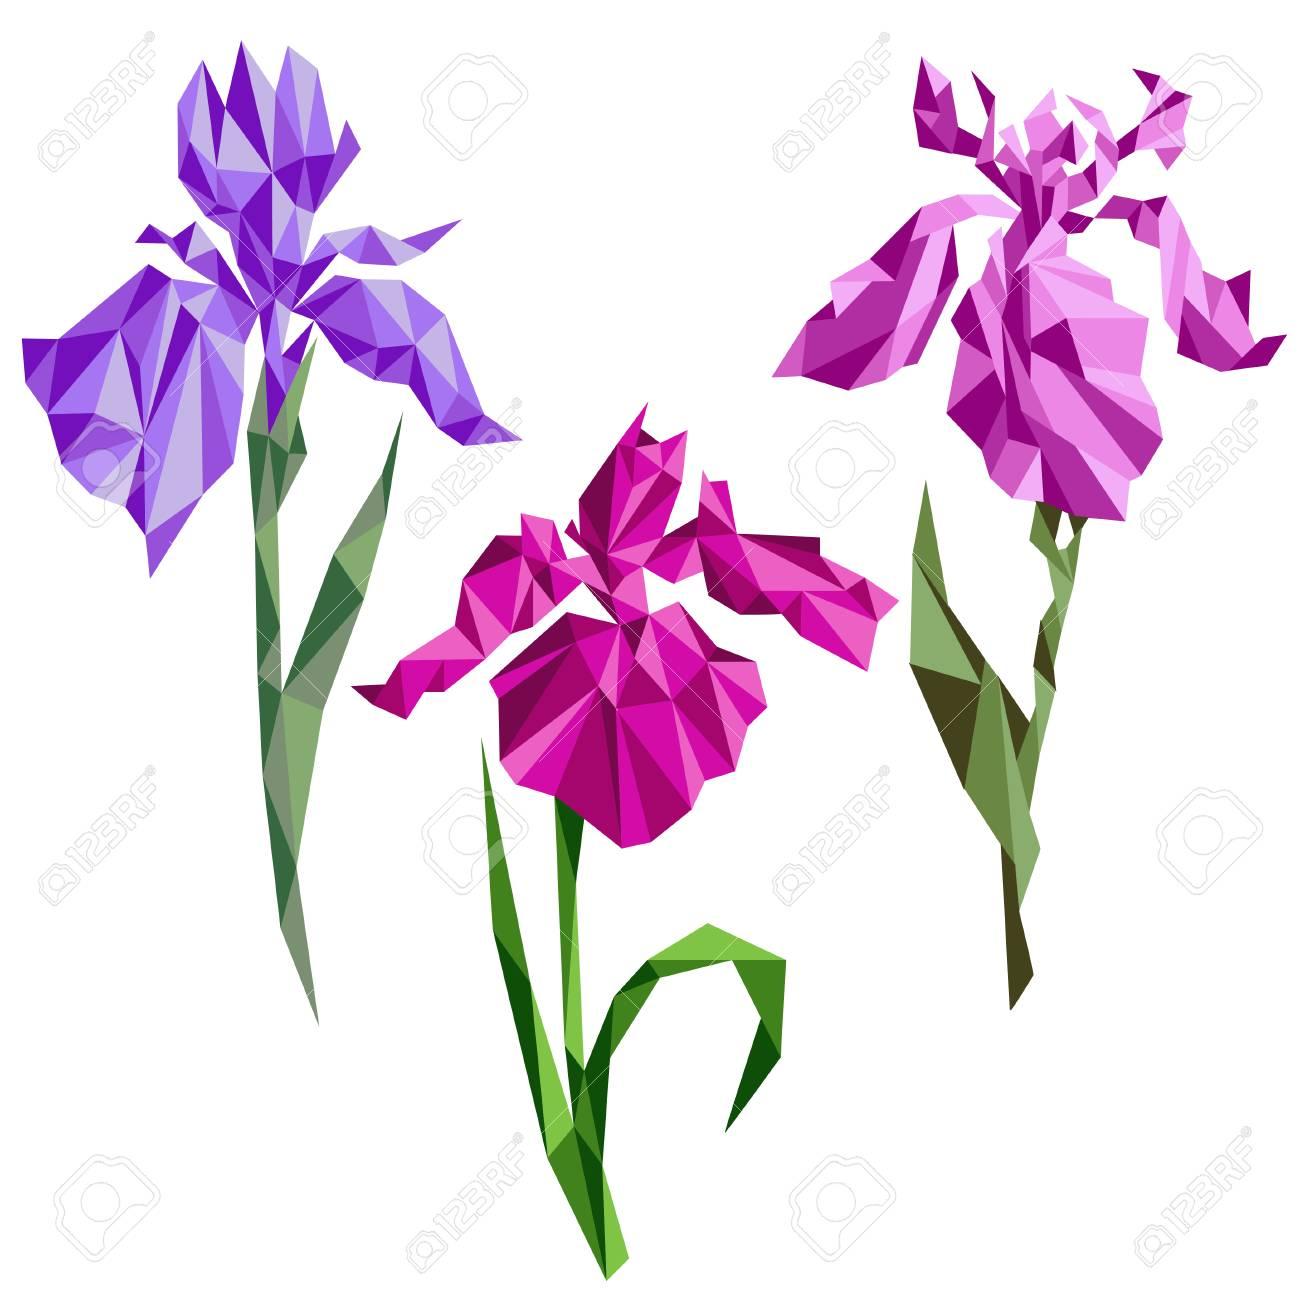 origami iris 2   Papiroflexia flores, Origami flores, Rosas origami   1300x1300